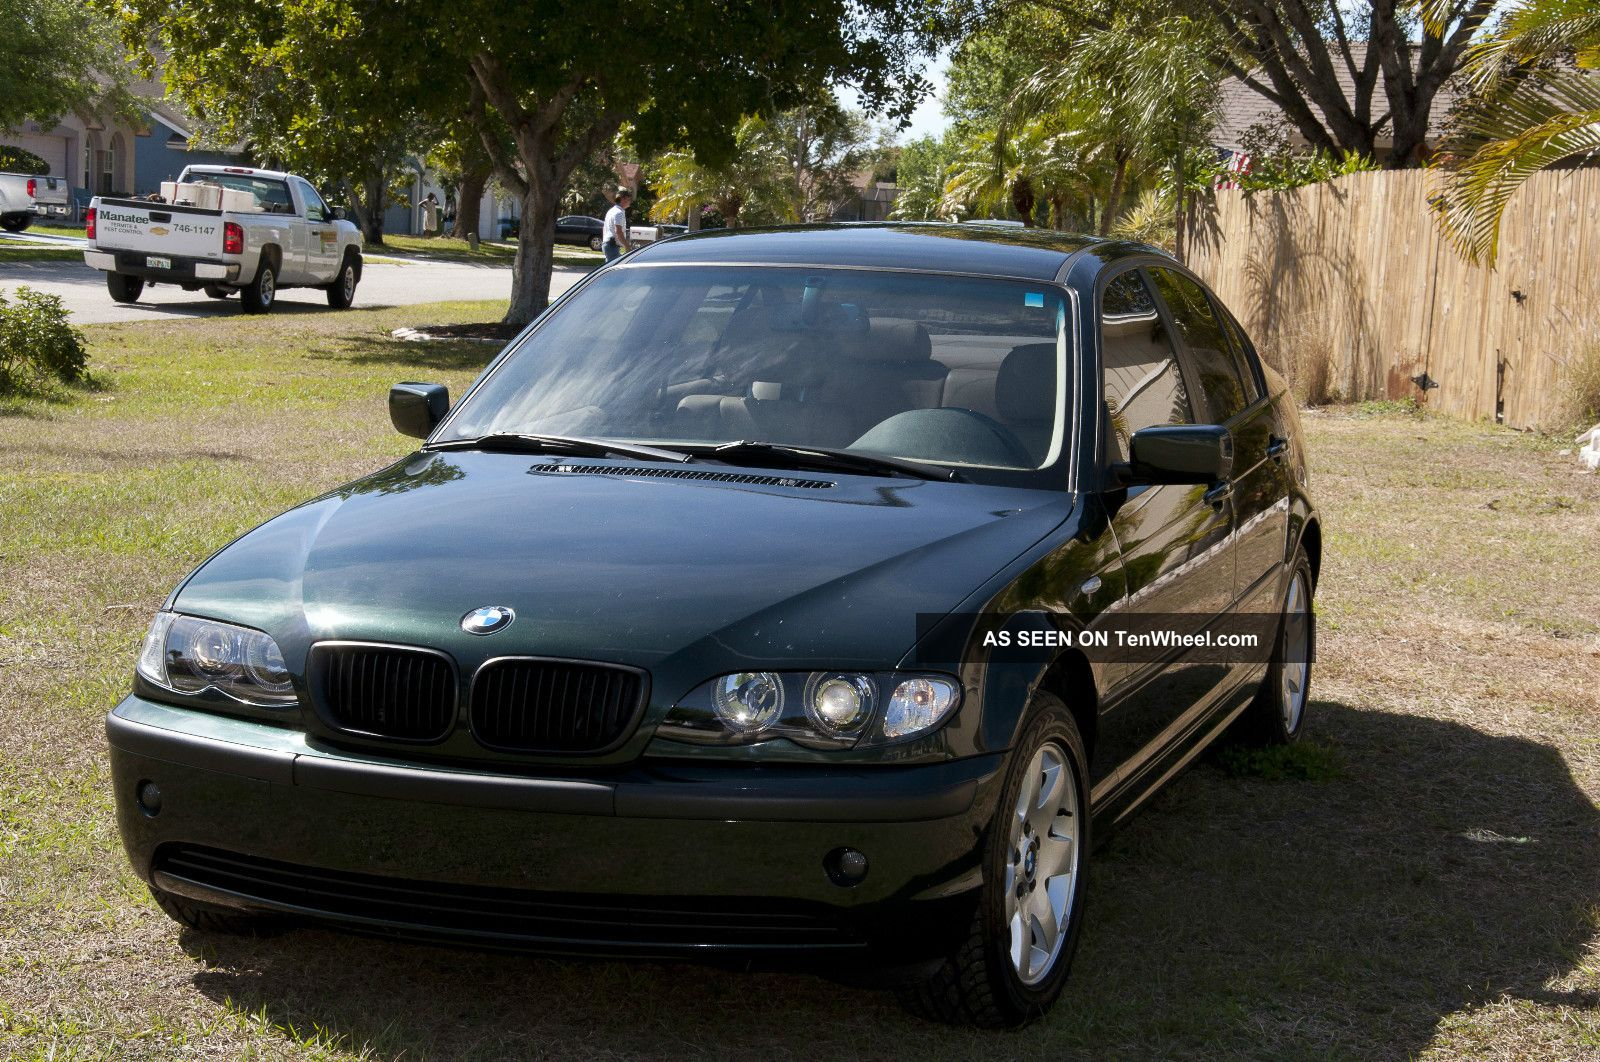 2002 bmw 325xi base sedan 4 door 2 5l awd 4x4 fl garage. Black Bedroom Furniture Sets. Home Design Ideas